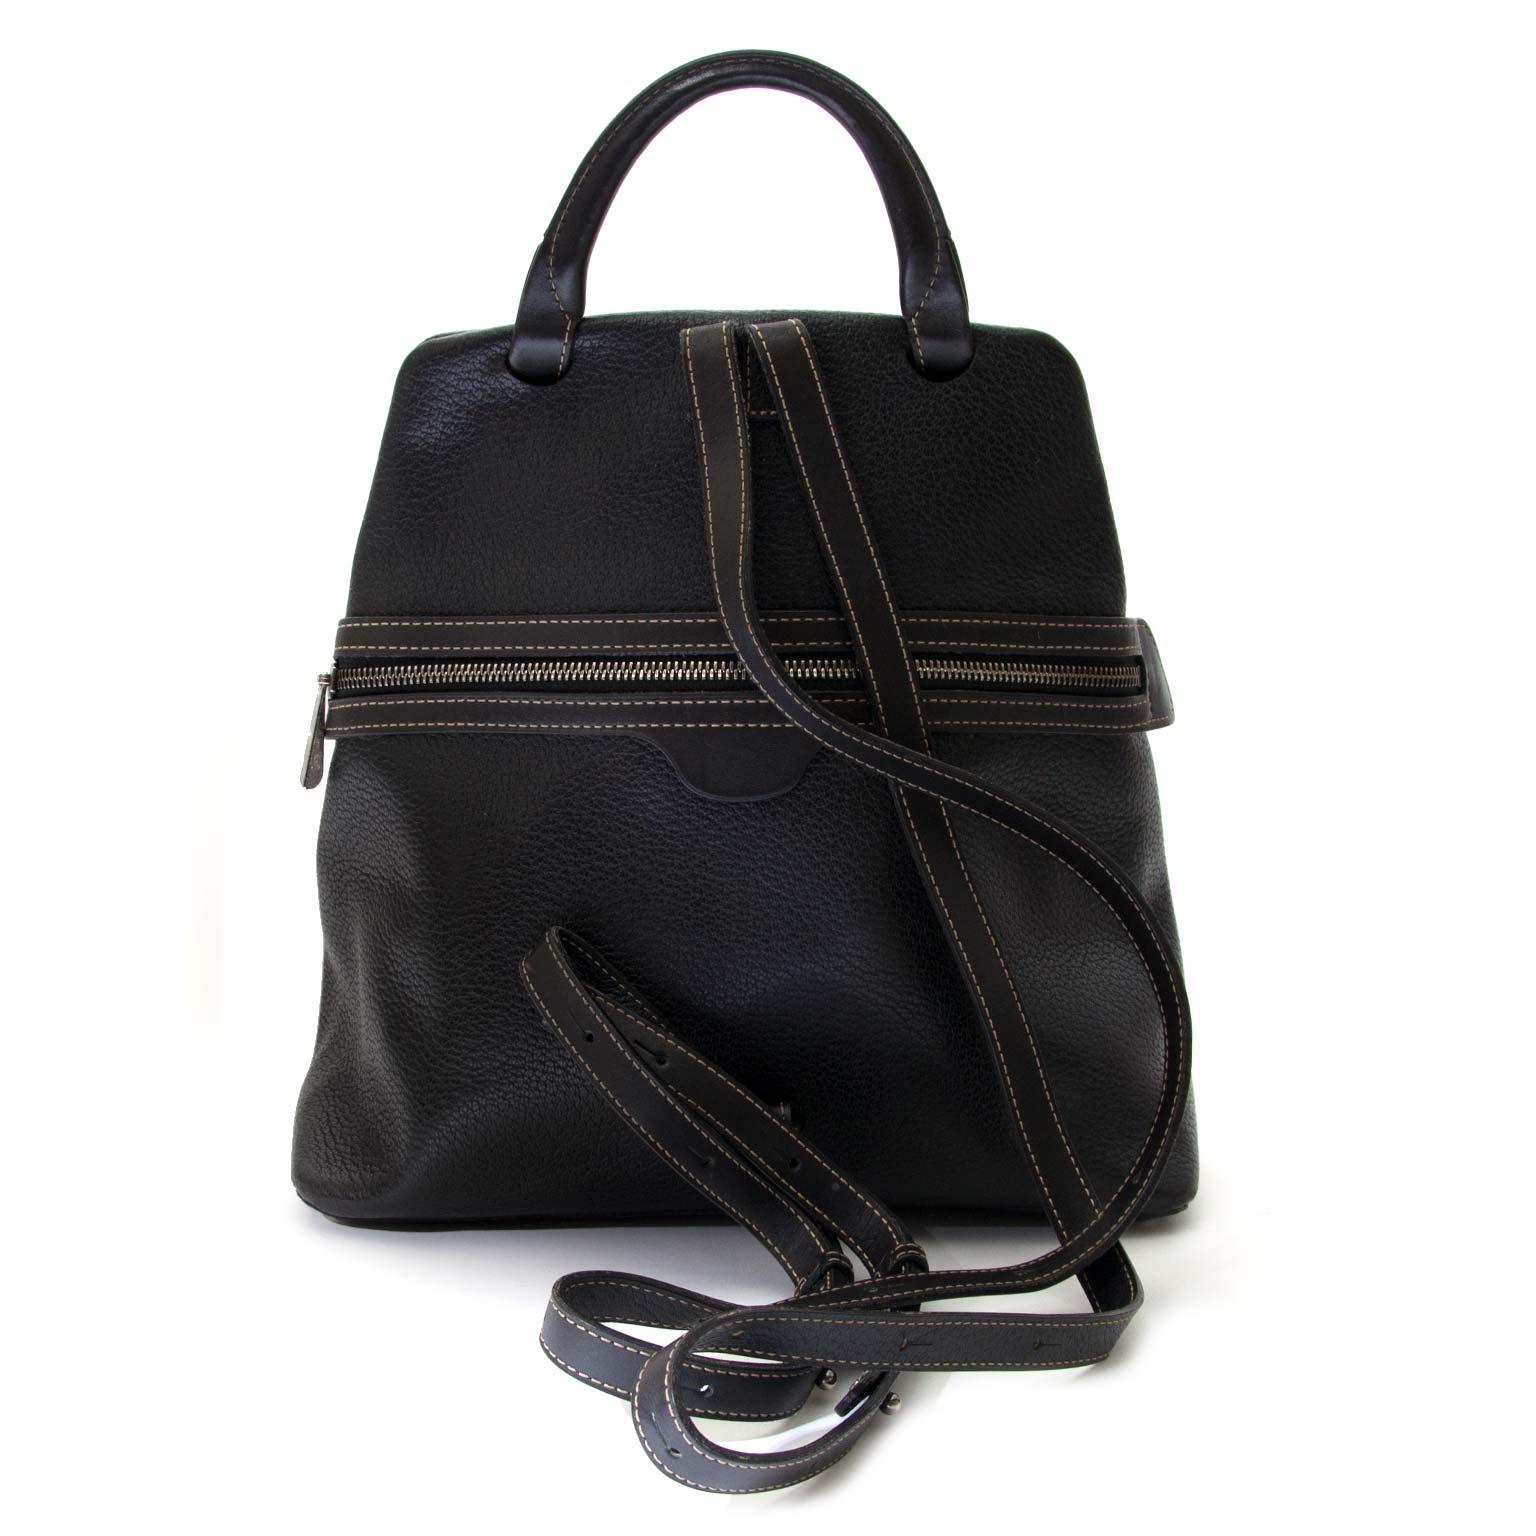 secondhand Deux De Delvaux Black Leather Backpack for sale at labellov